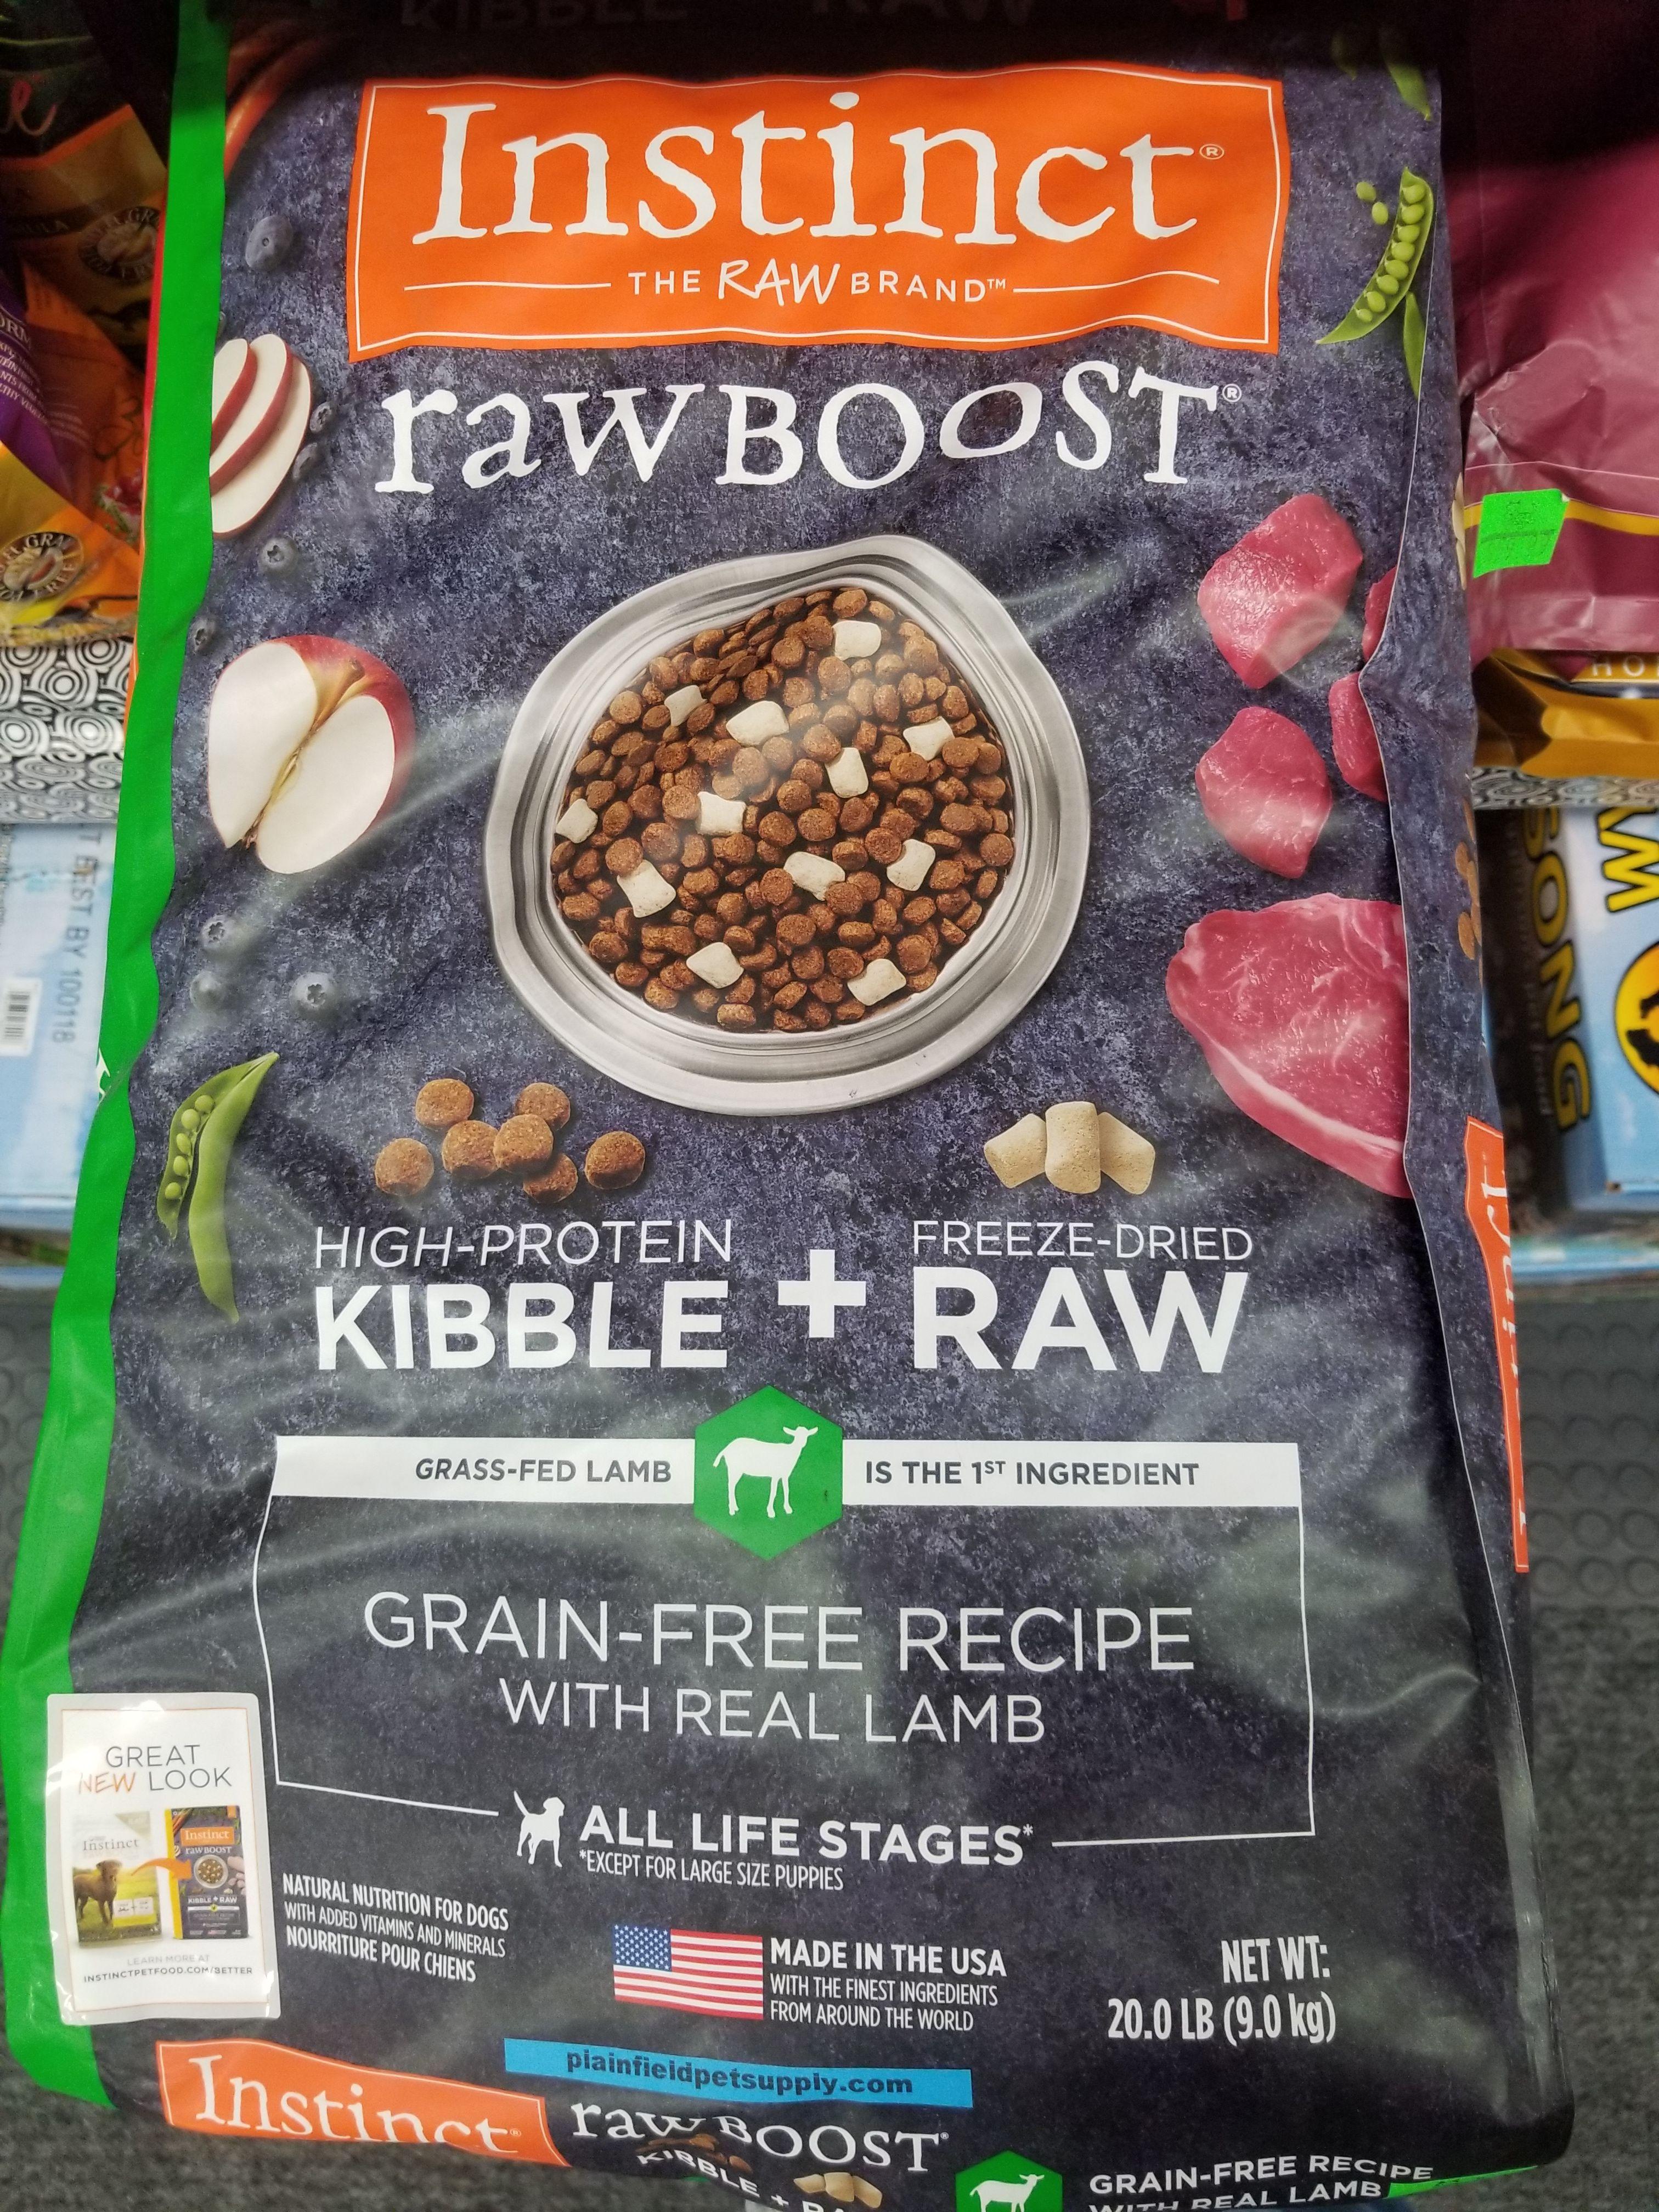 Instinct Raw Boost Dog Food Combines Grain Free High Protein